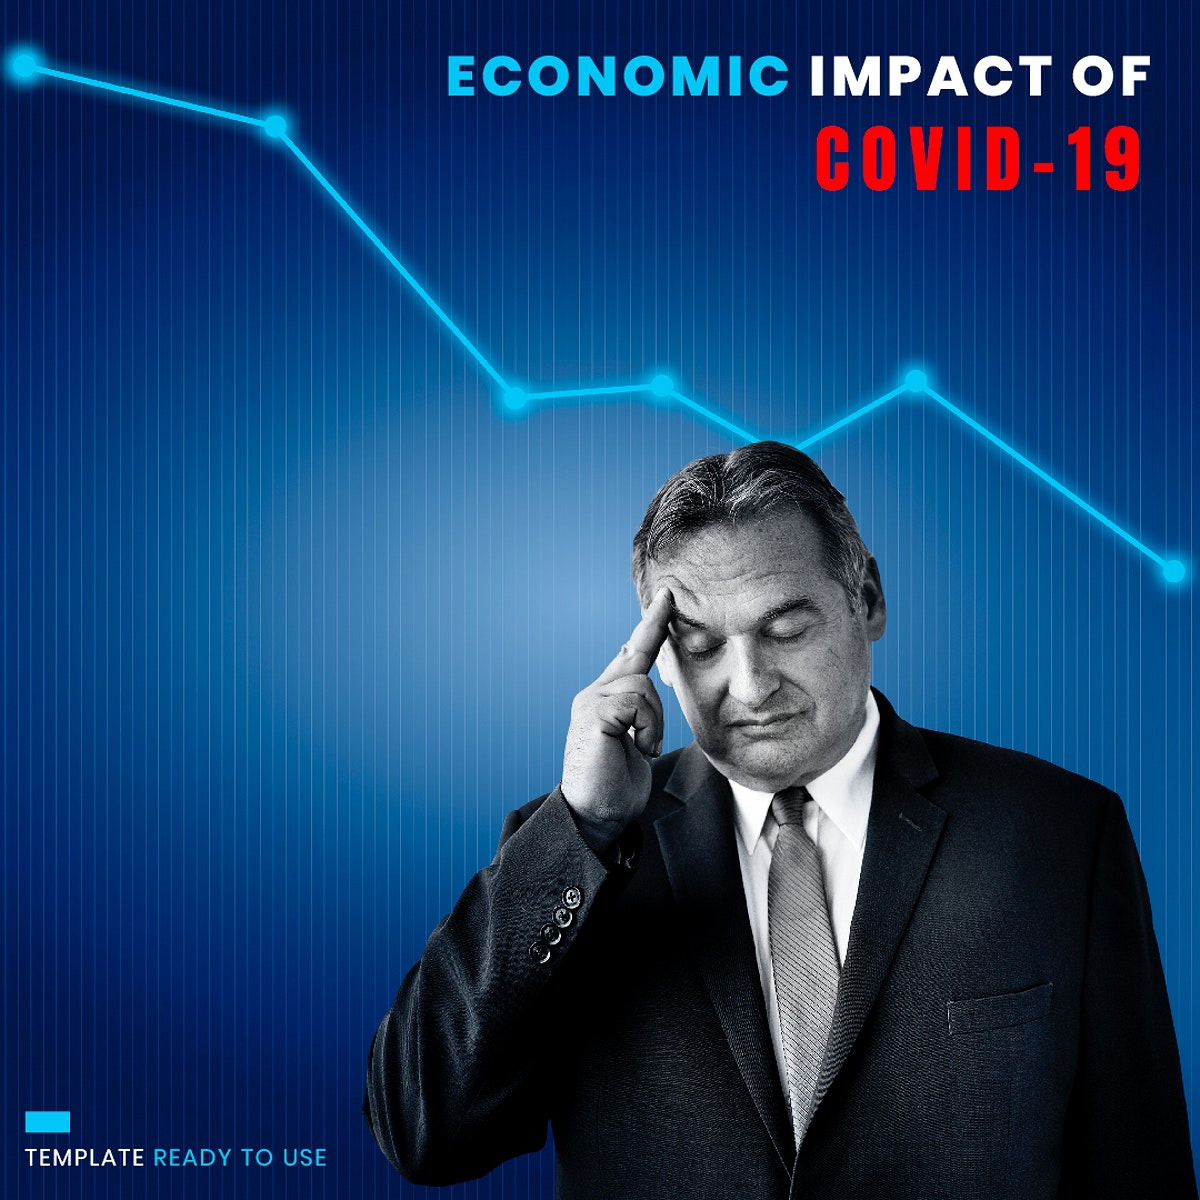 Economic impact of COVID-19 mockup